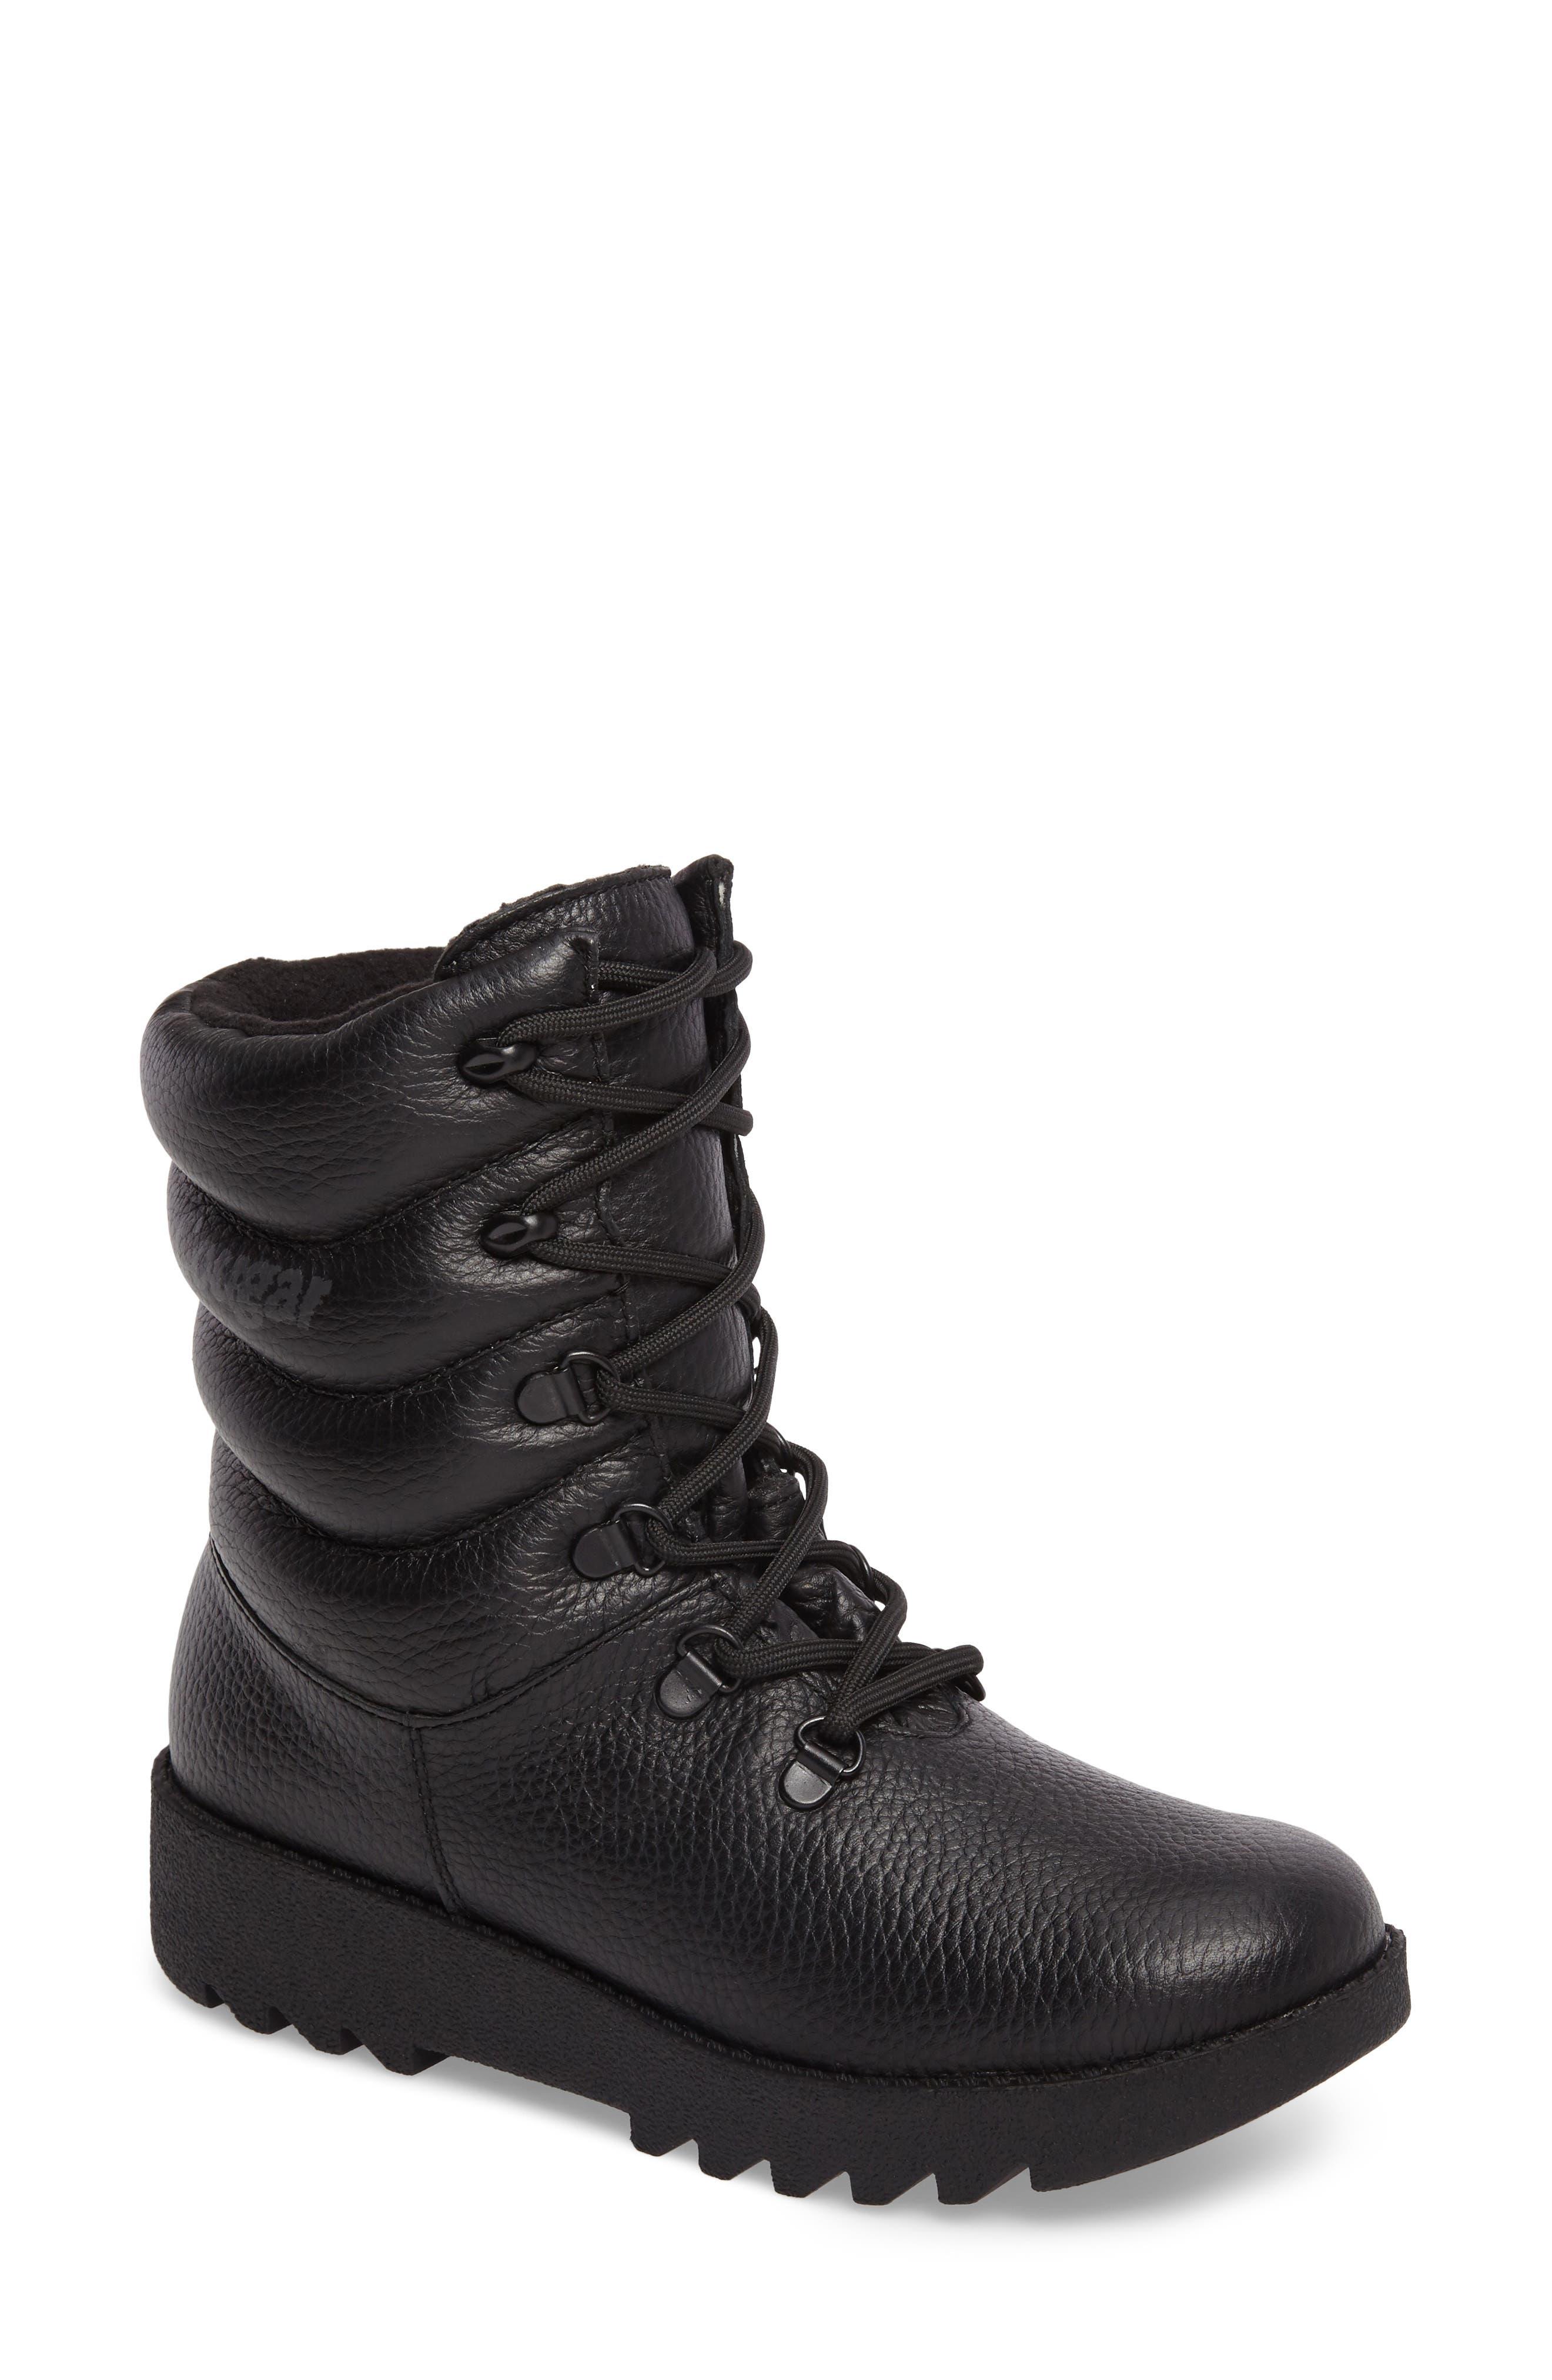 Cougar Blackout Waterproof Boot, Black